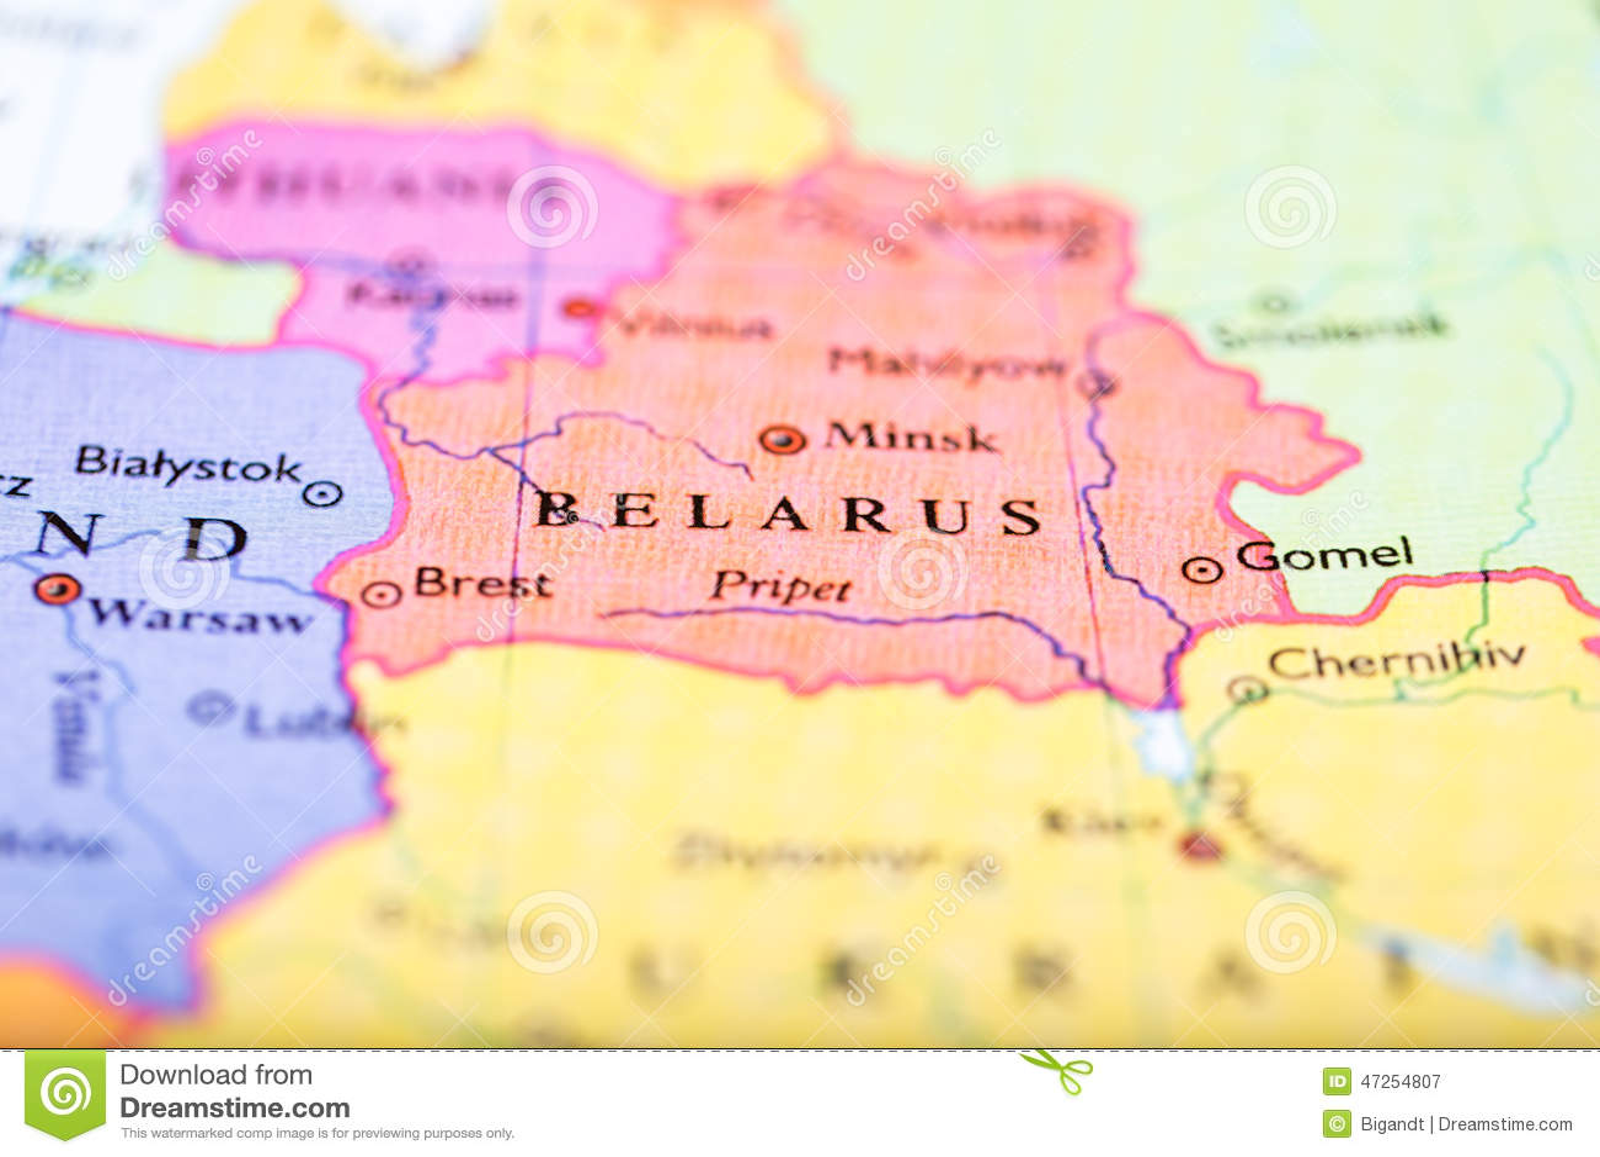 Map Of Europe Centered On Belarus Stock Image - Image of push ...